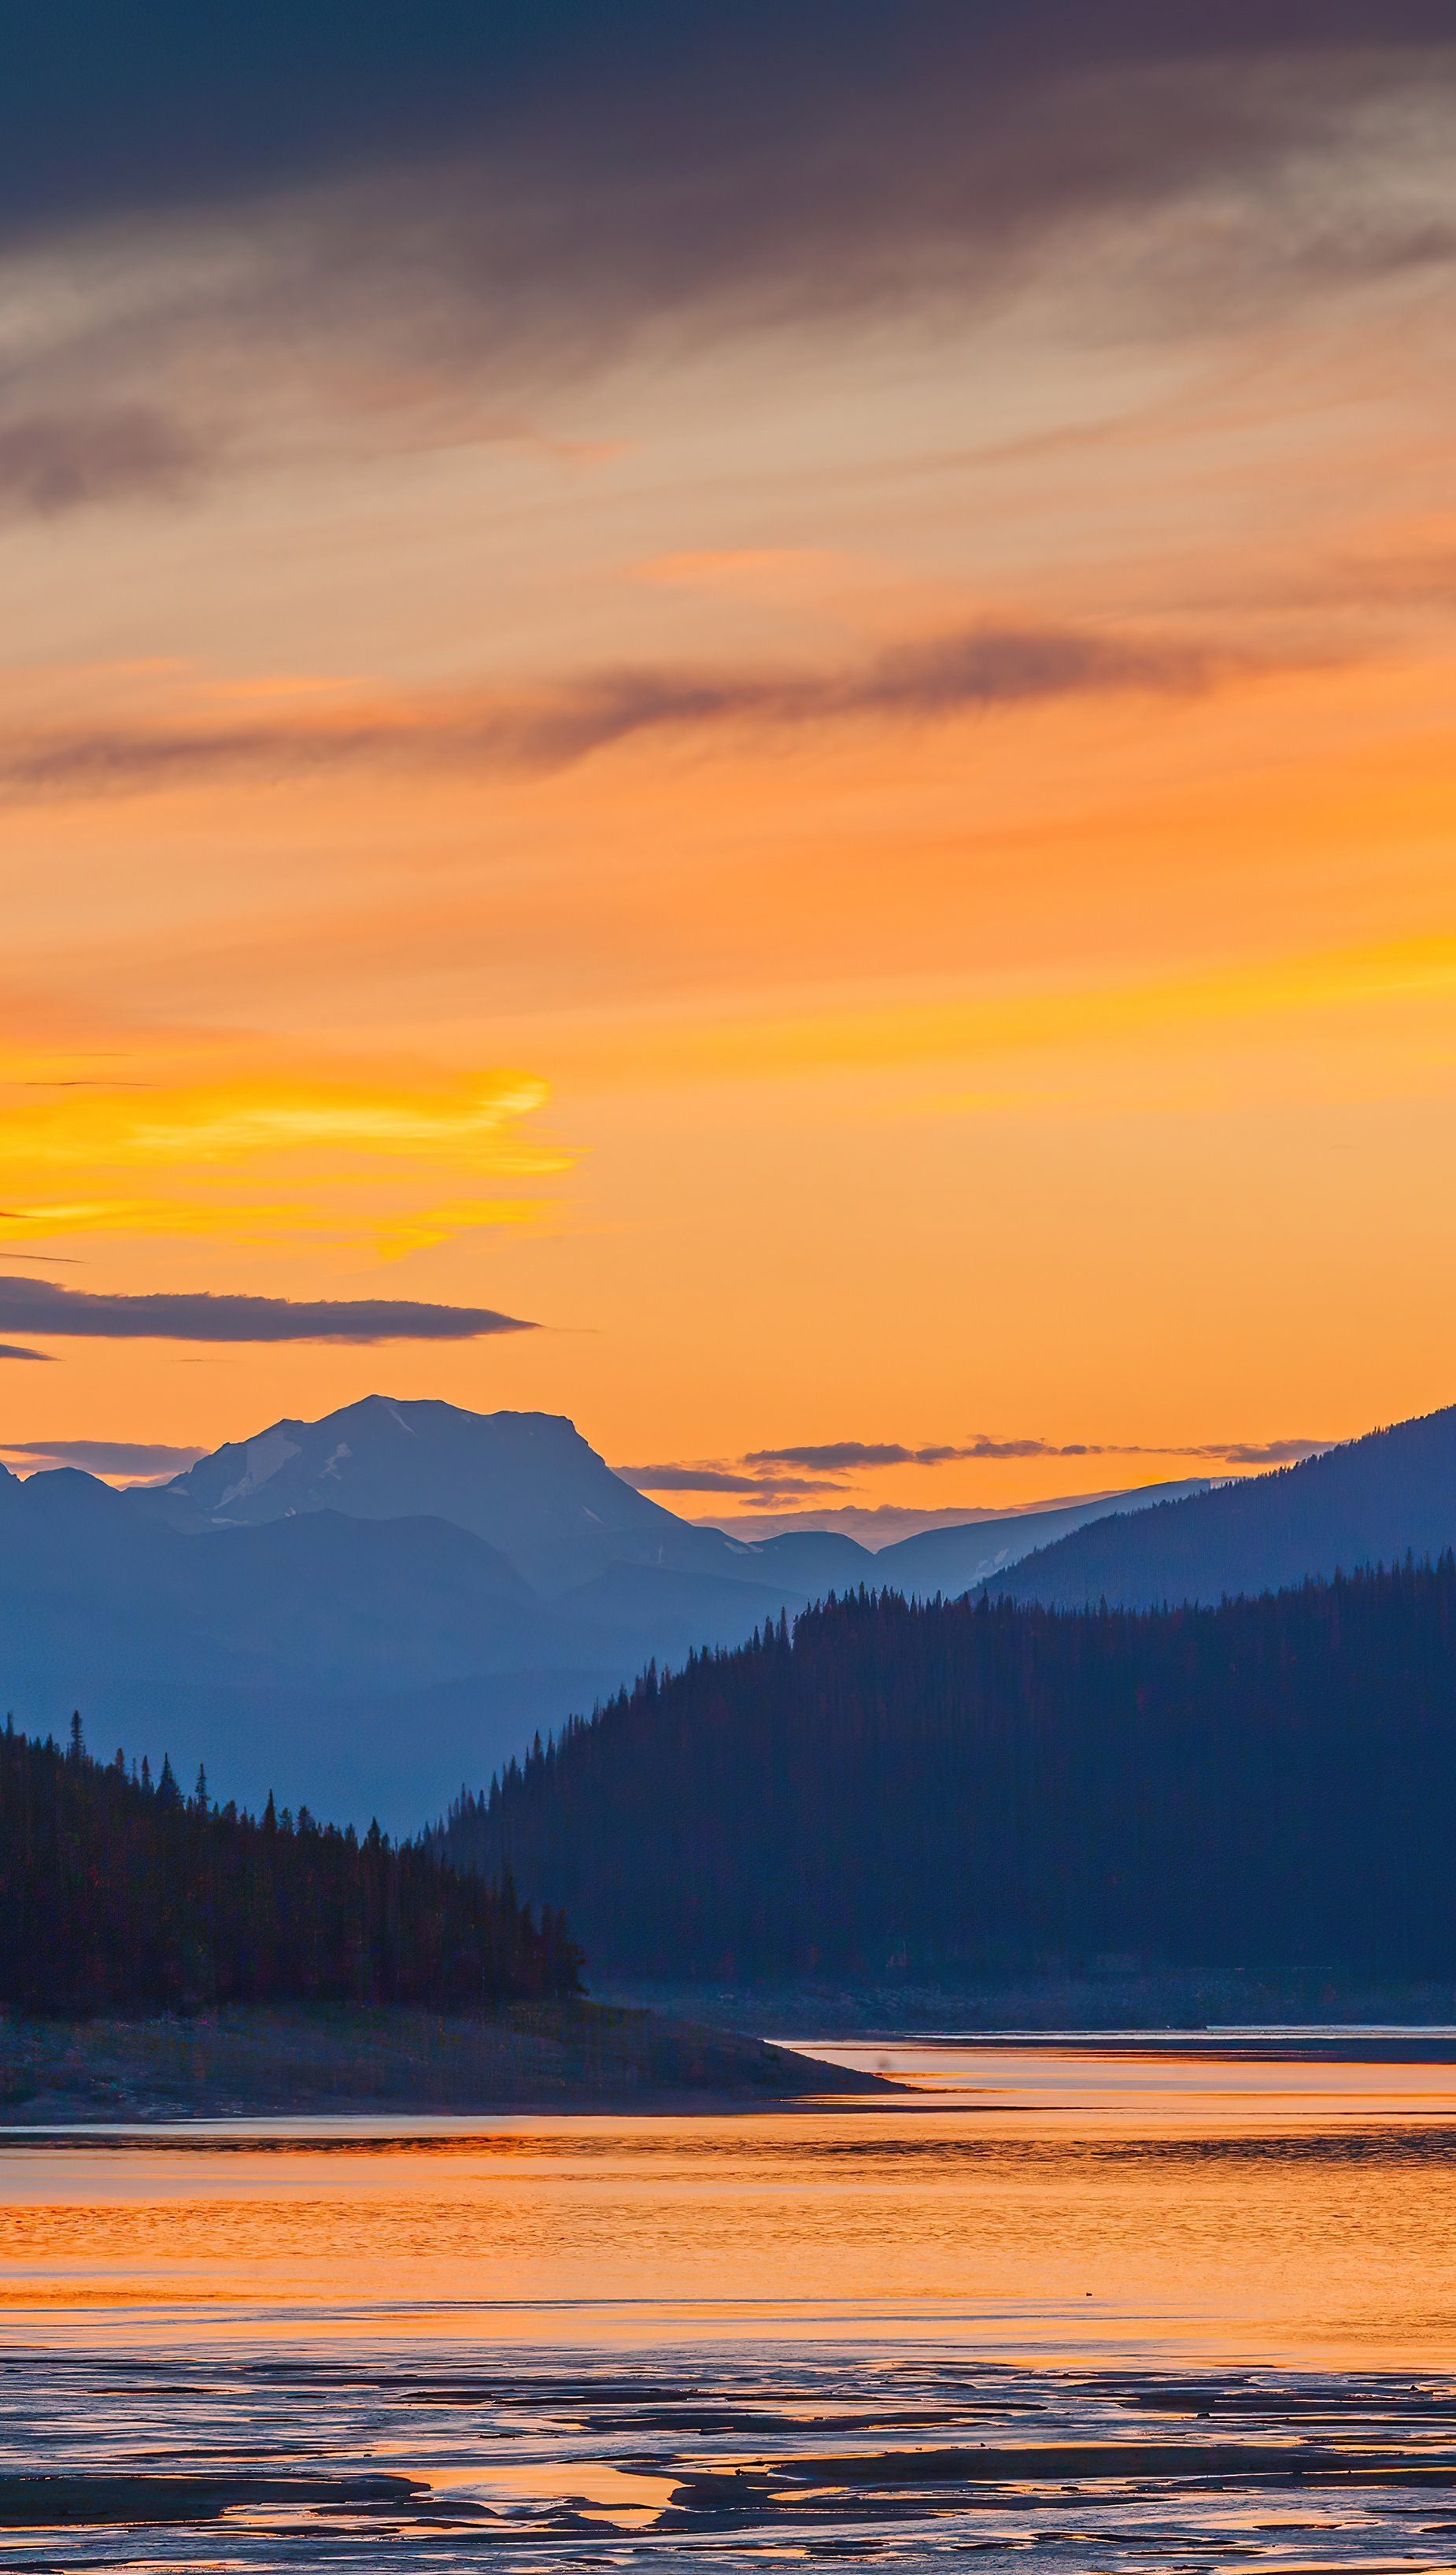 Wallpaper Sunset in lake next to mountains Digital Art Vertical